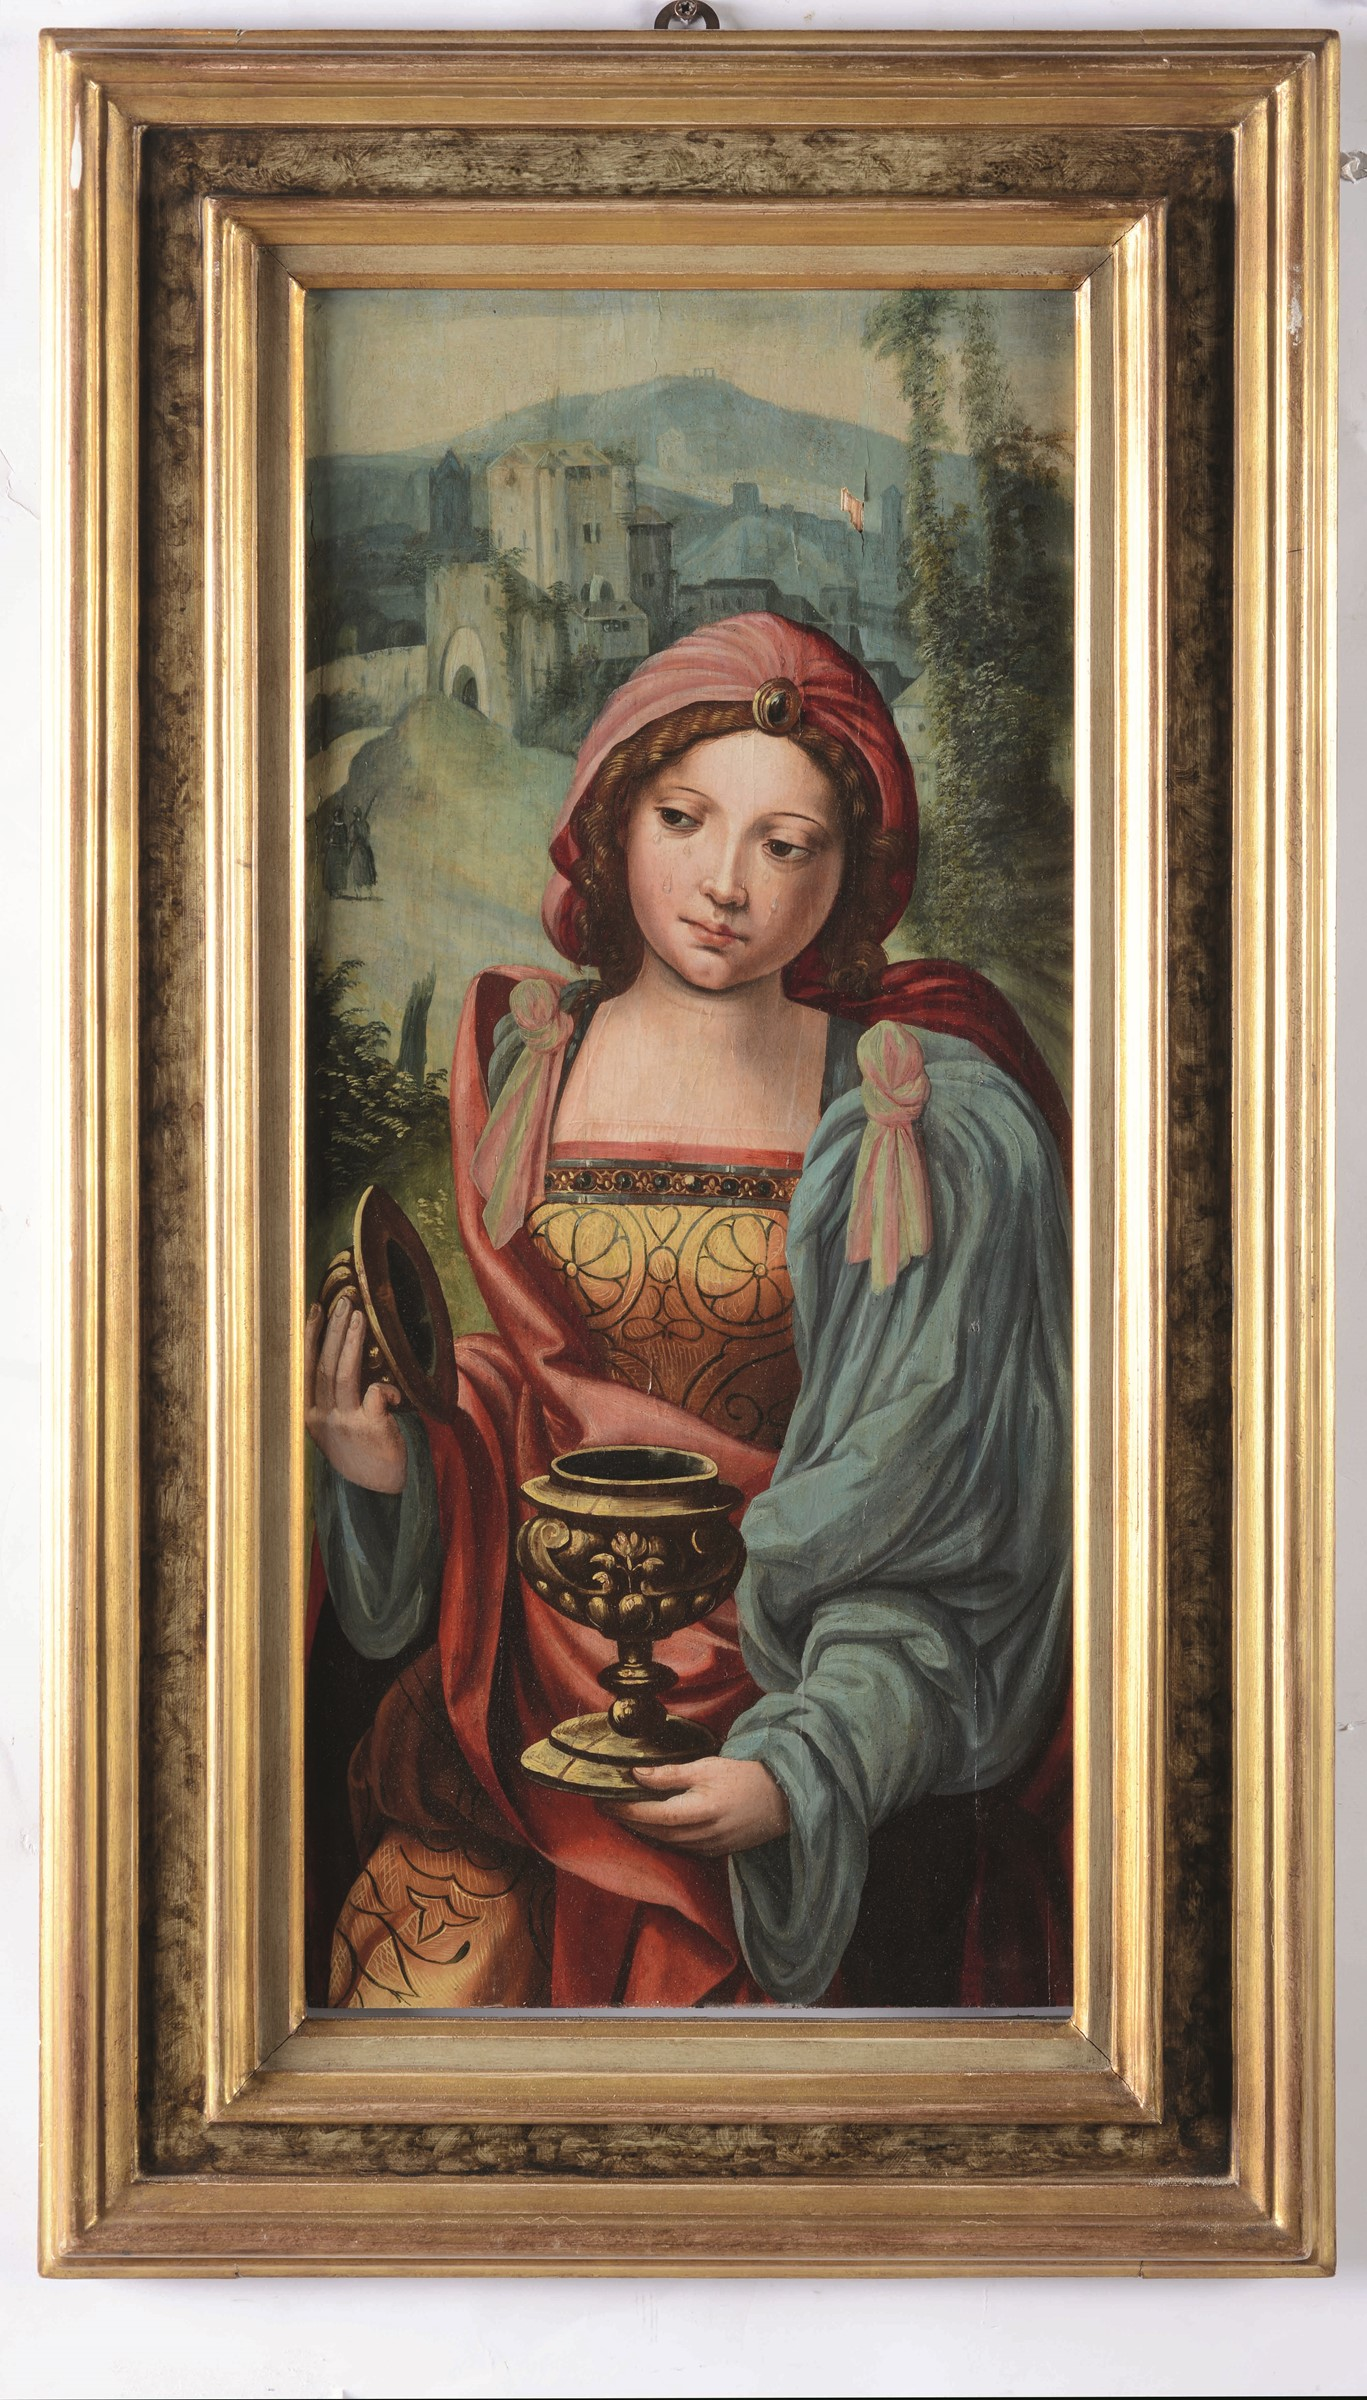 Marten Jacob Van Heemskerk (Heemskerk 1498 - Haarlem 1574), Maddalena - olio su [...] - Image 3 of 3